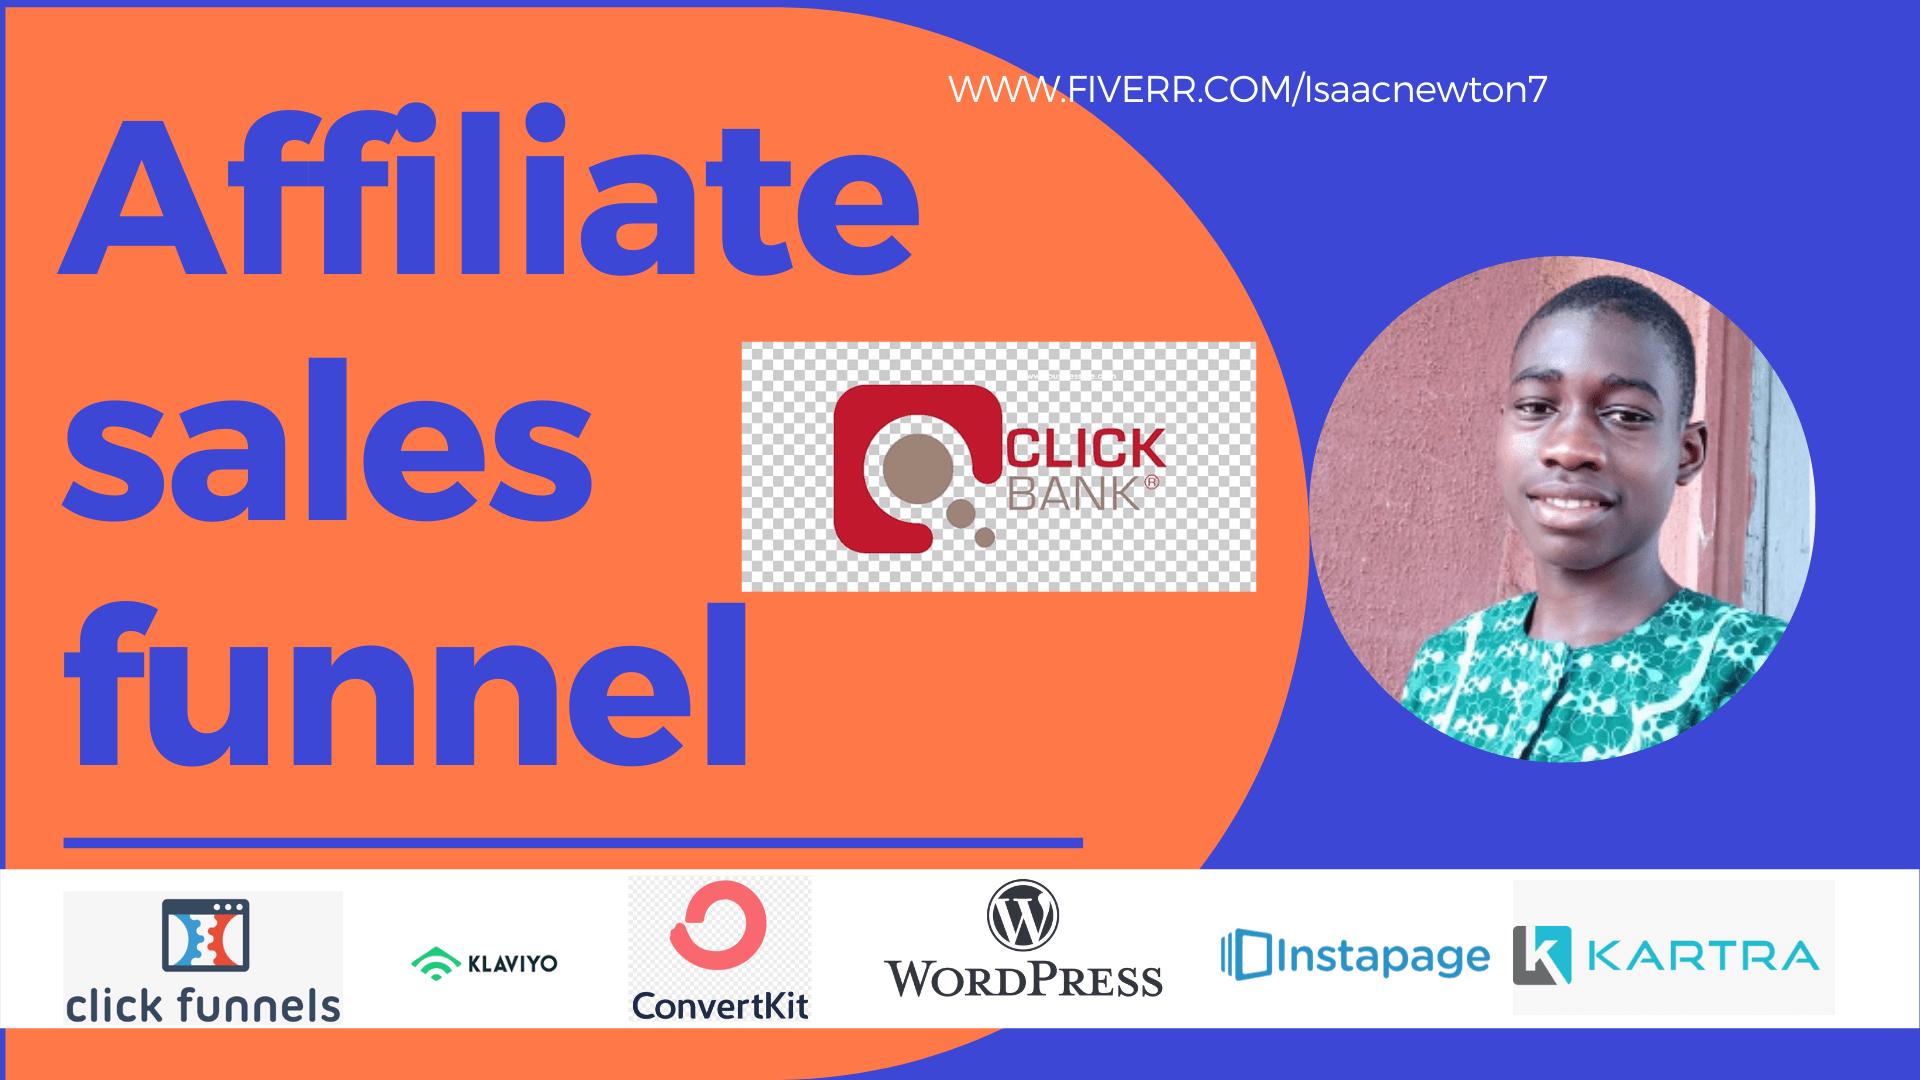 Build clickfunnels clickbank affliate sales funnel, affiliate marketing, FiverrBox